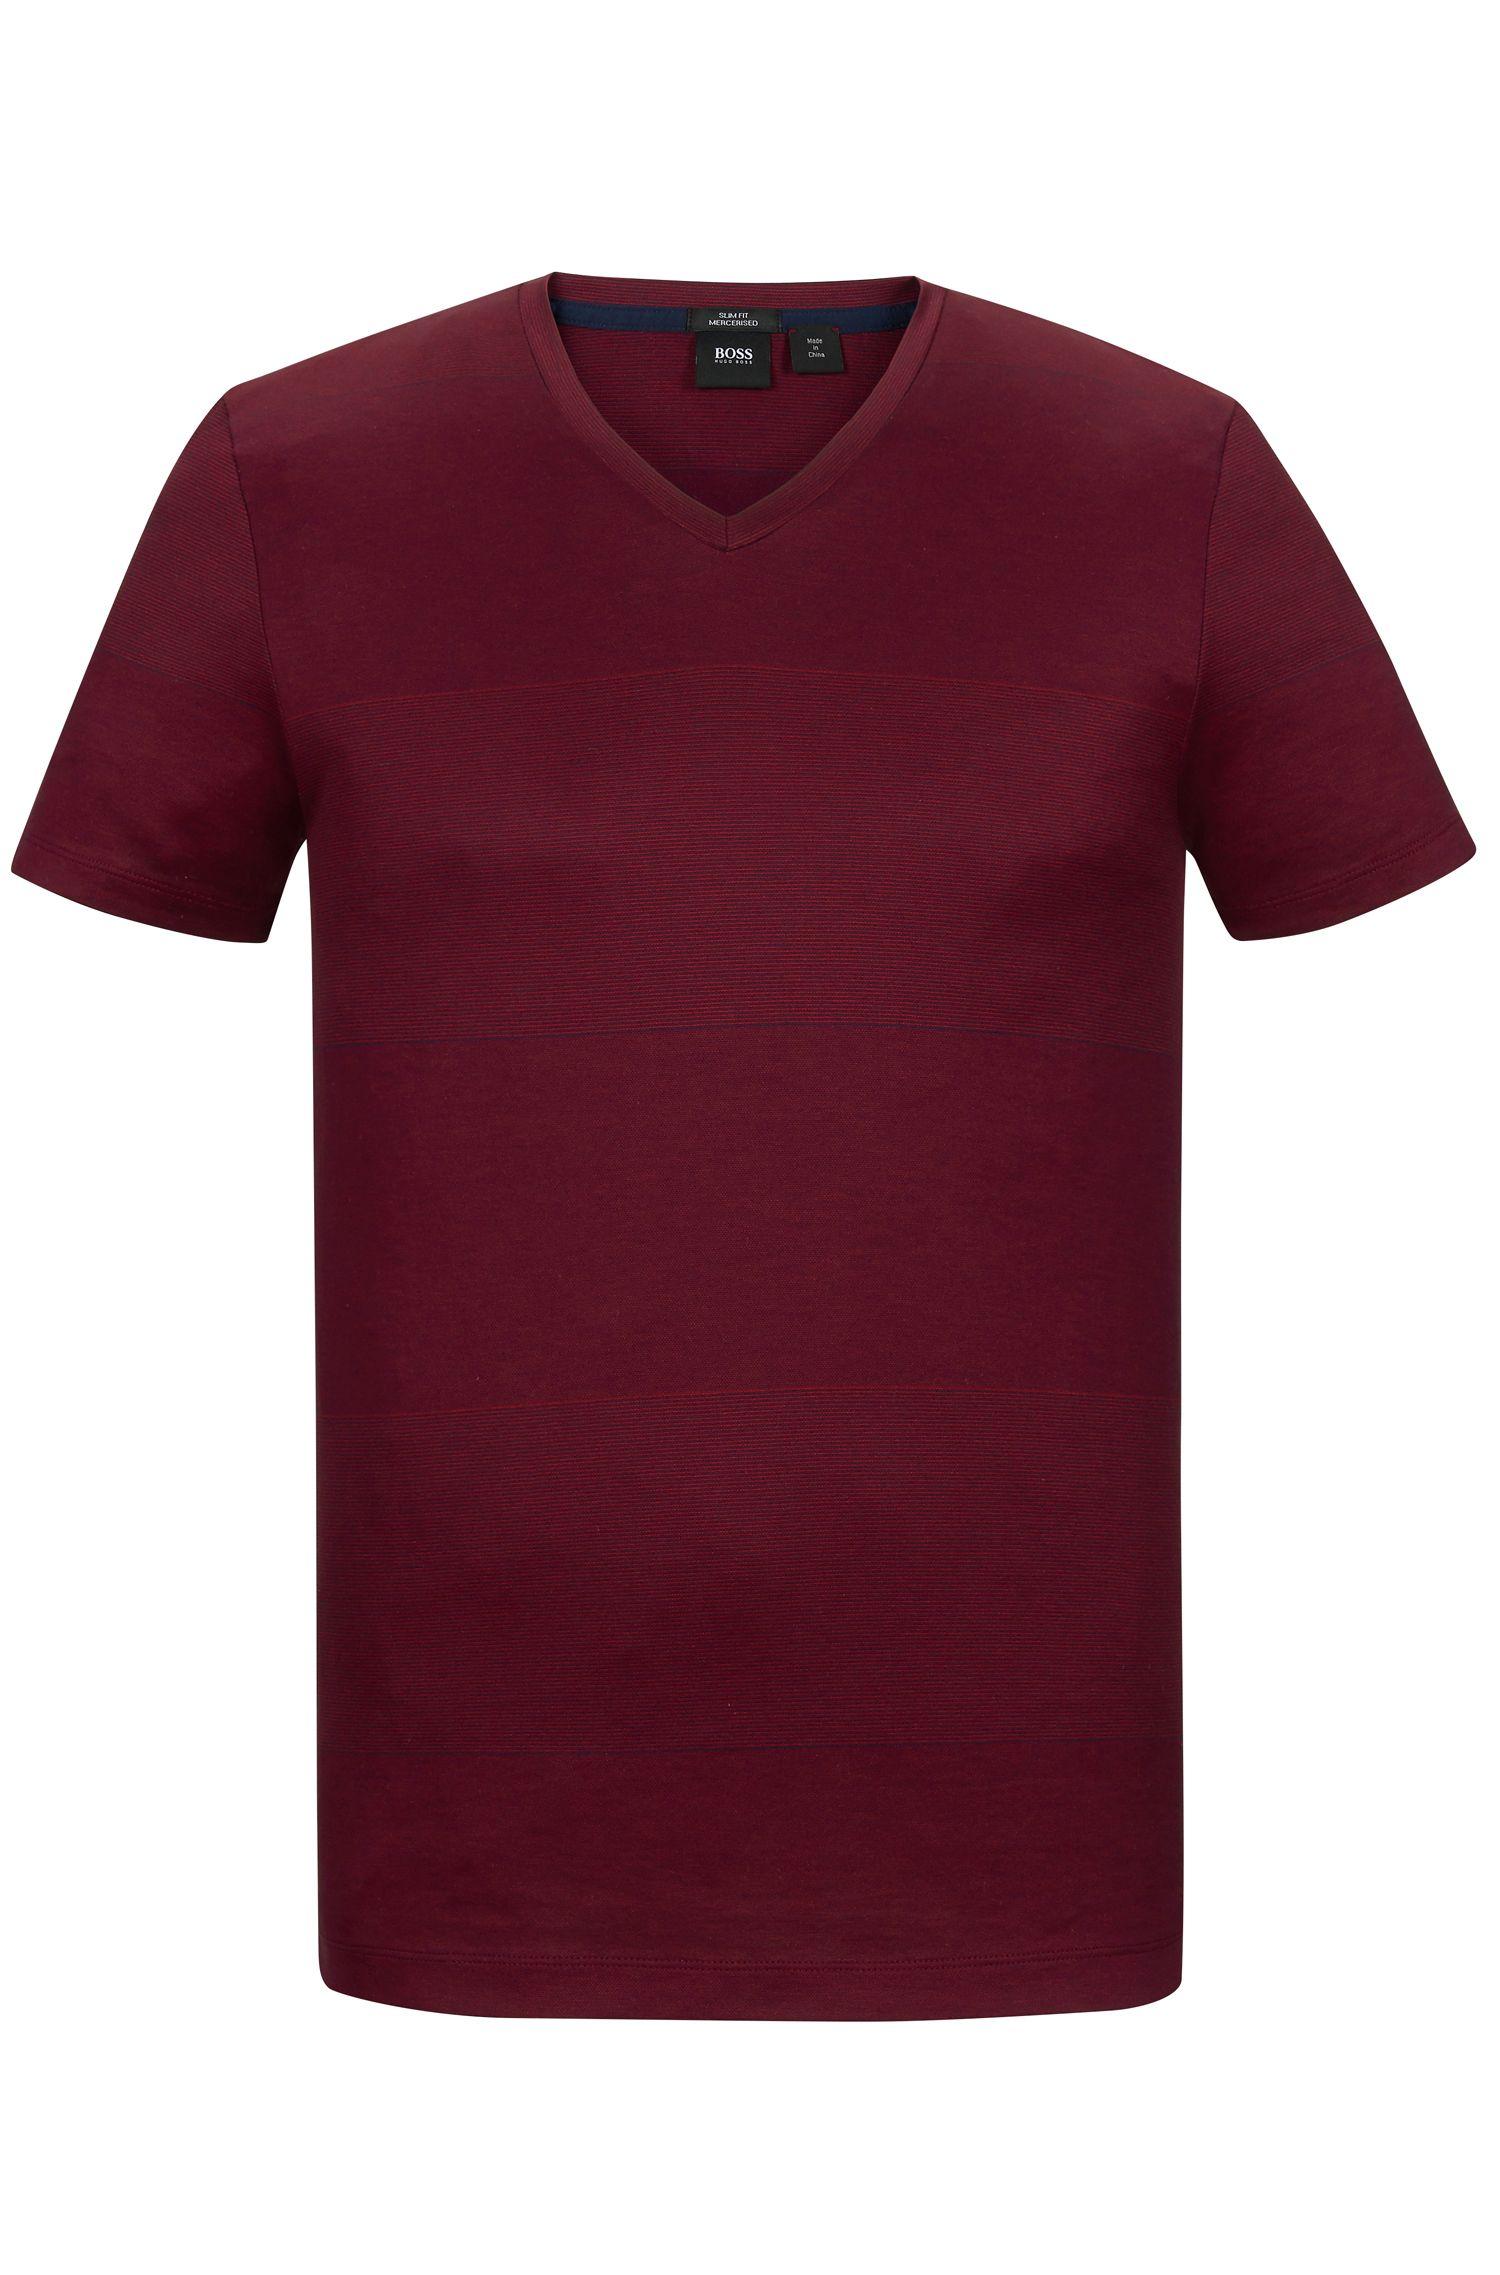 Striped Mercerized Cotton T-Shirt   Teal